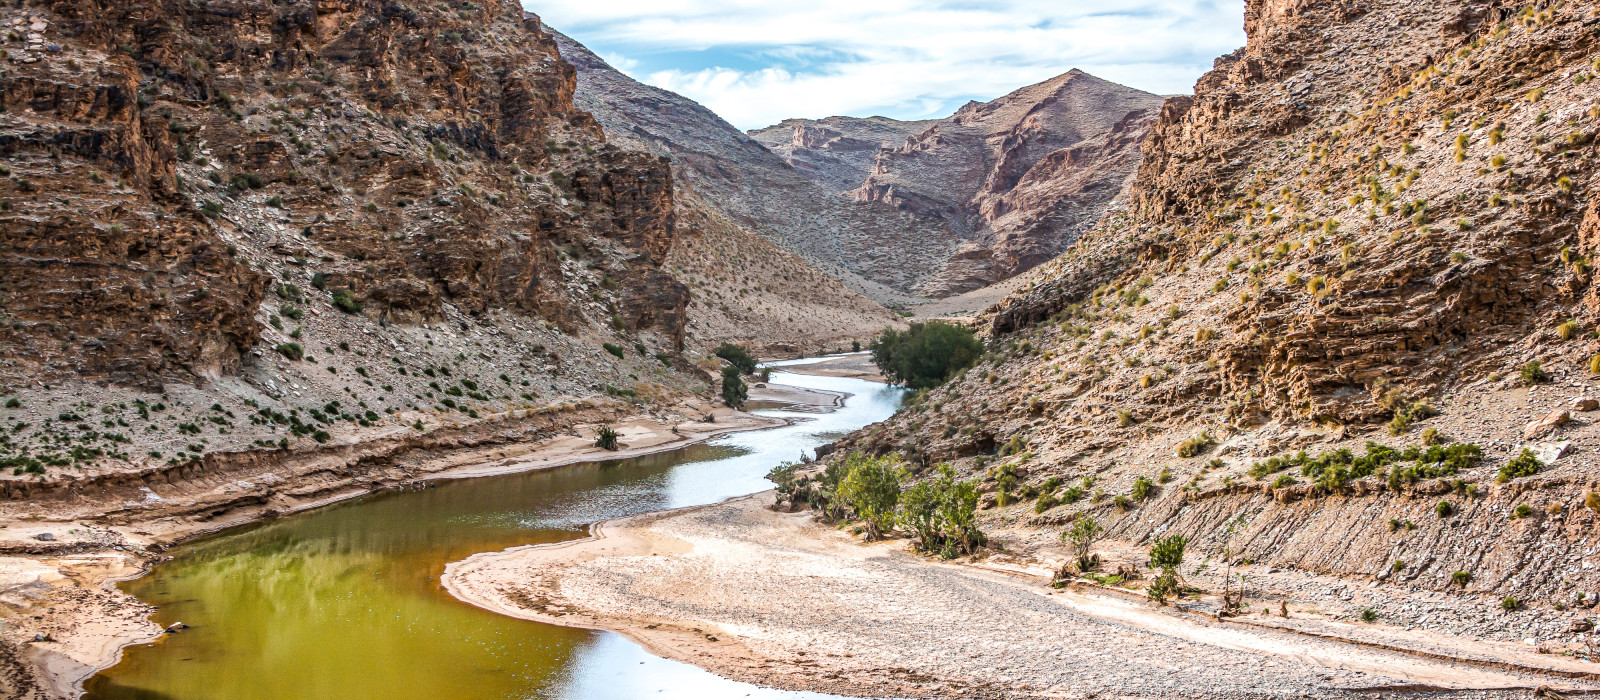 Reiseziel Midelt Marokko